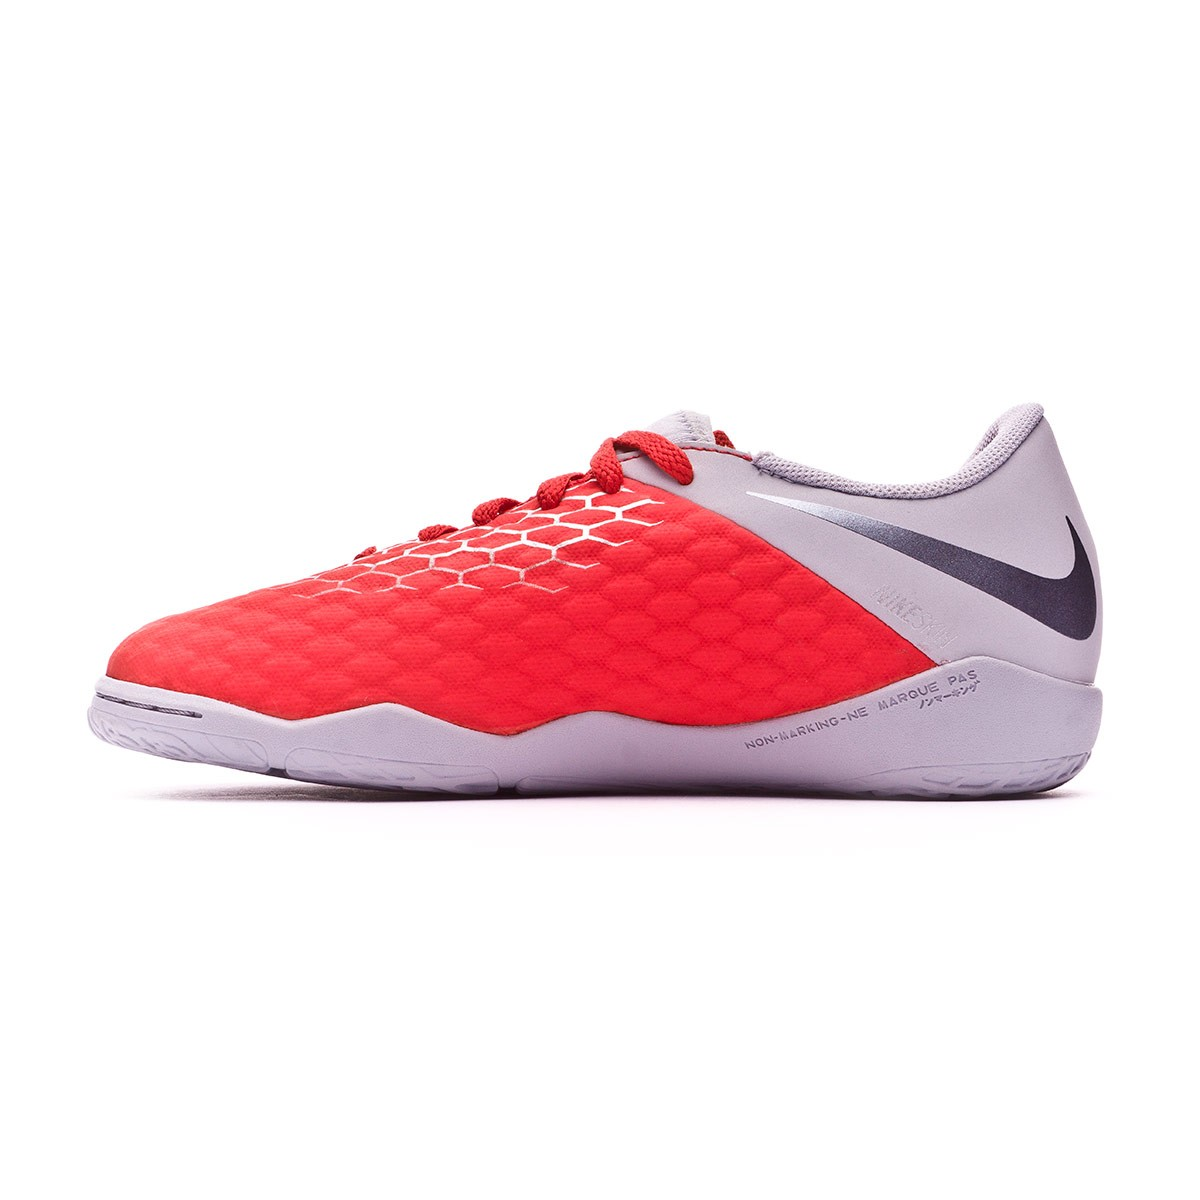 20352f76de76 Futsal Boot Nike Kids Hypervenom PhantomX III Academy IC Light  crimson-Metallic dark grey-Wolf grey - Football store Fútbol Emotion